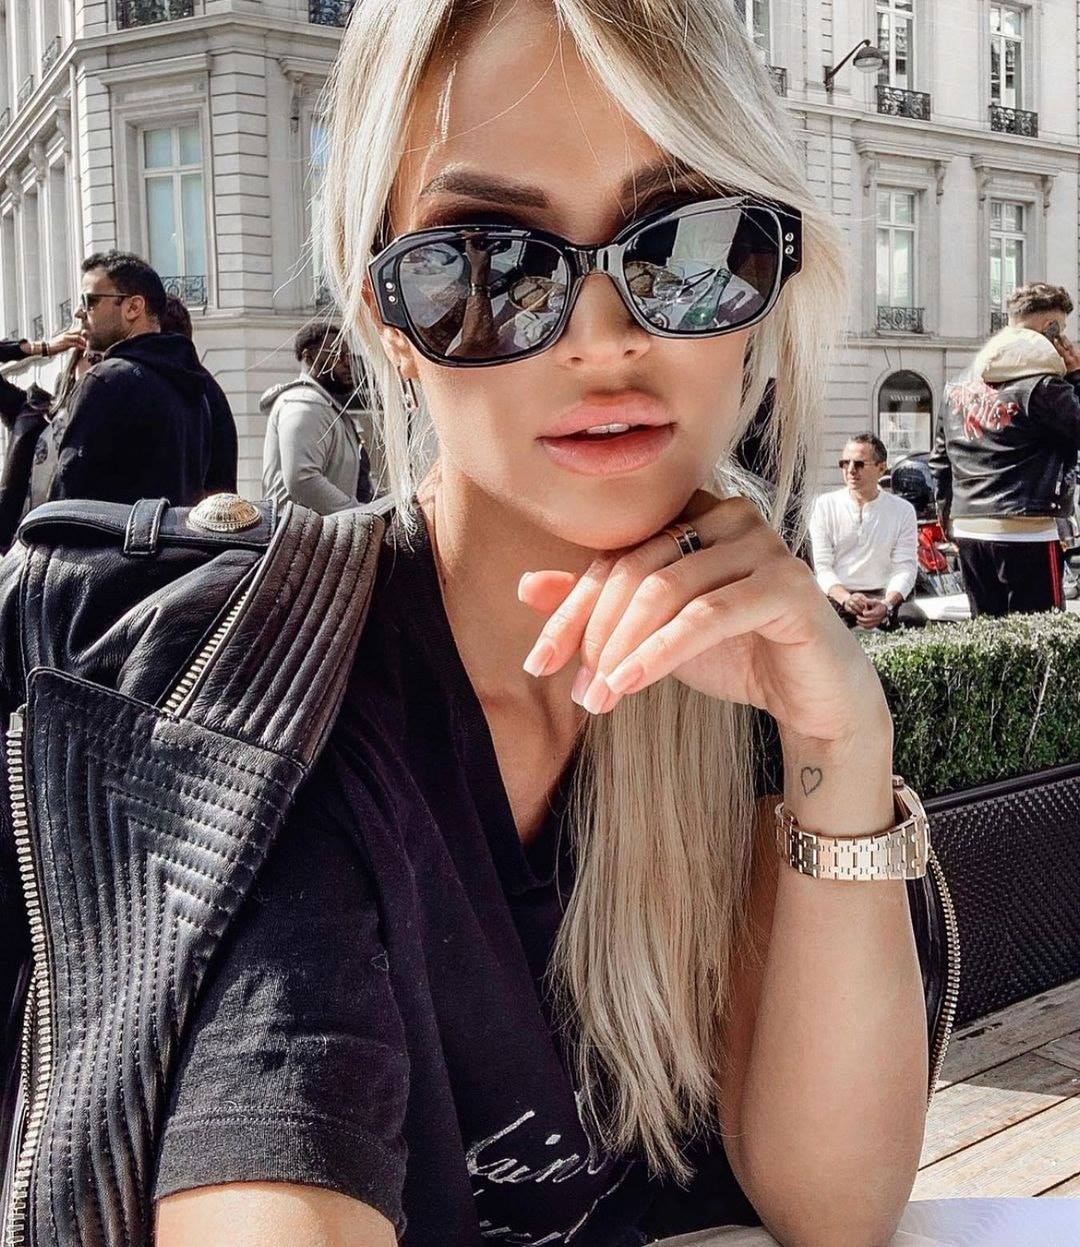 doktorica-poruka-dana-miss-zadovoljna-journal-lifestyle-mario_žuvela-sreća-živim-story-gloria-klix-ultra-n1-avaz-bonjour